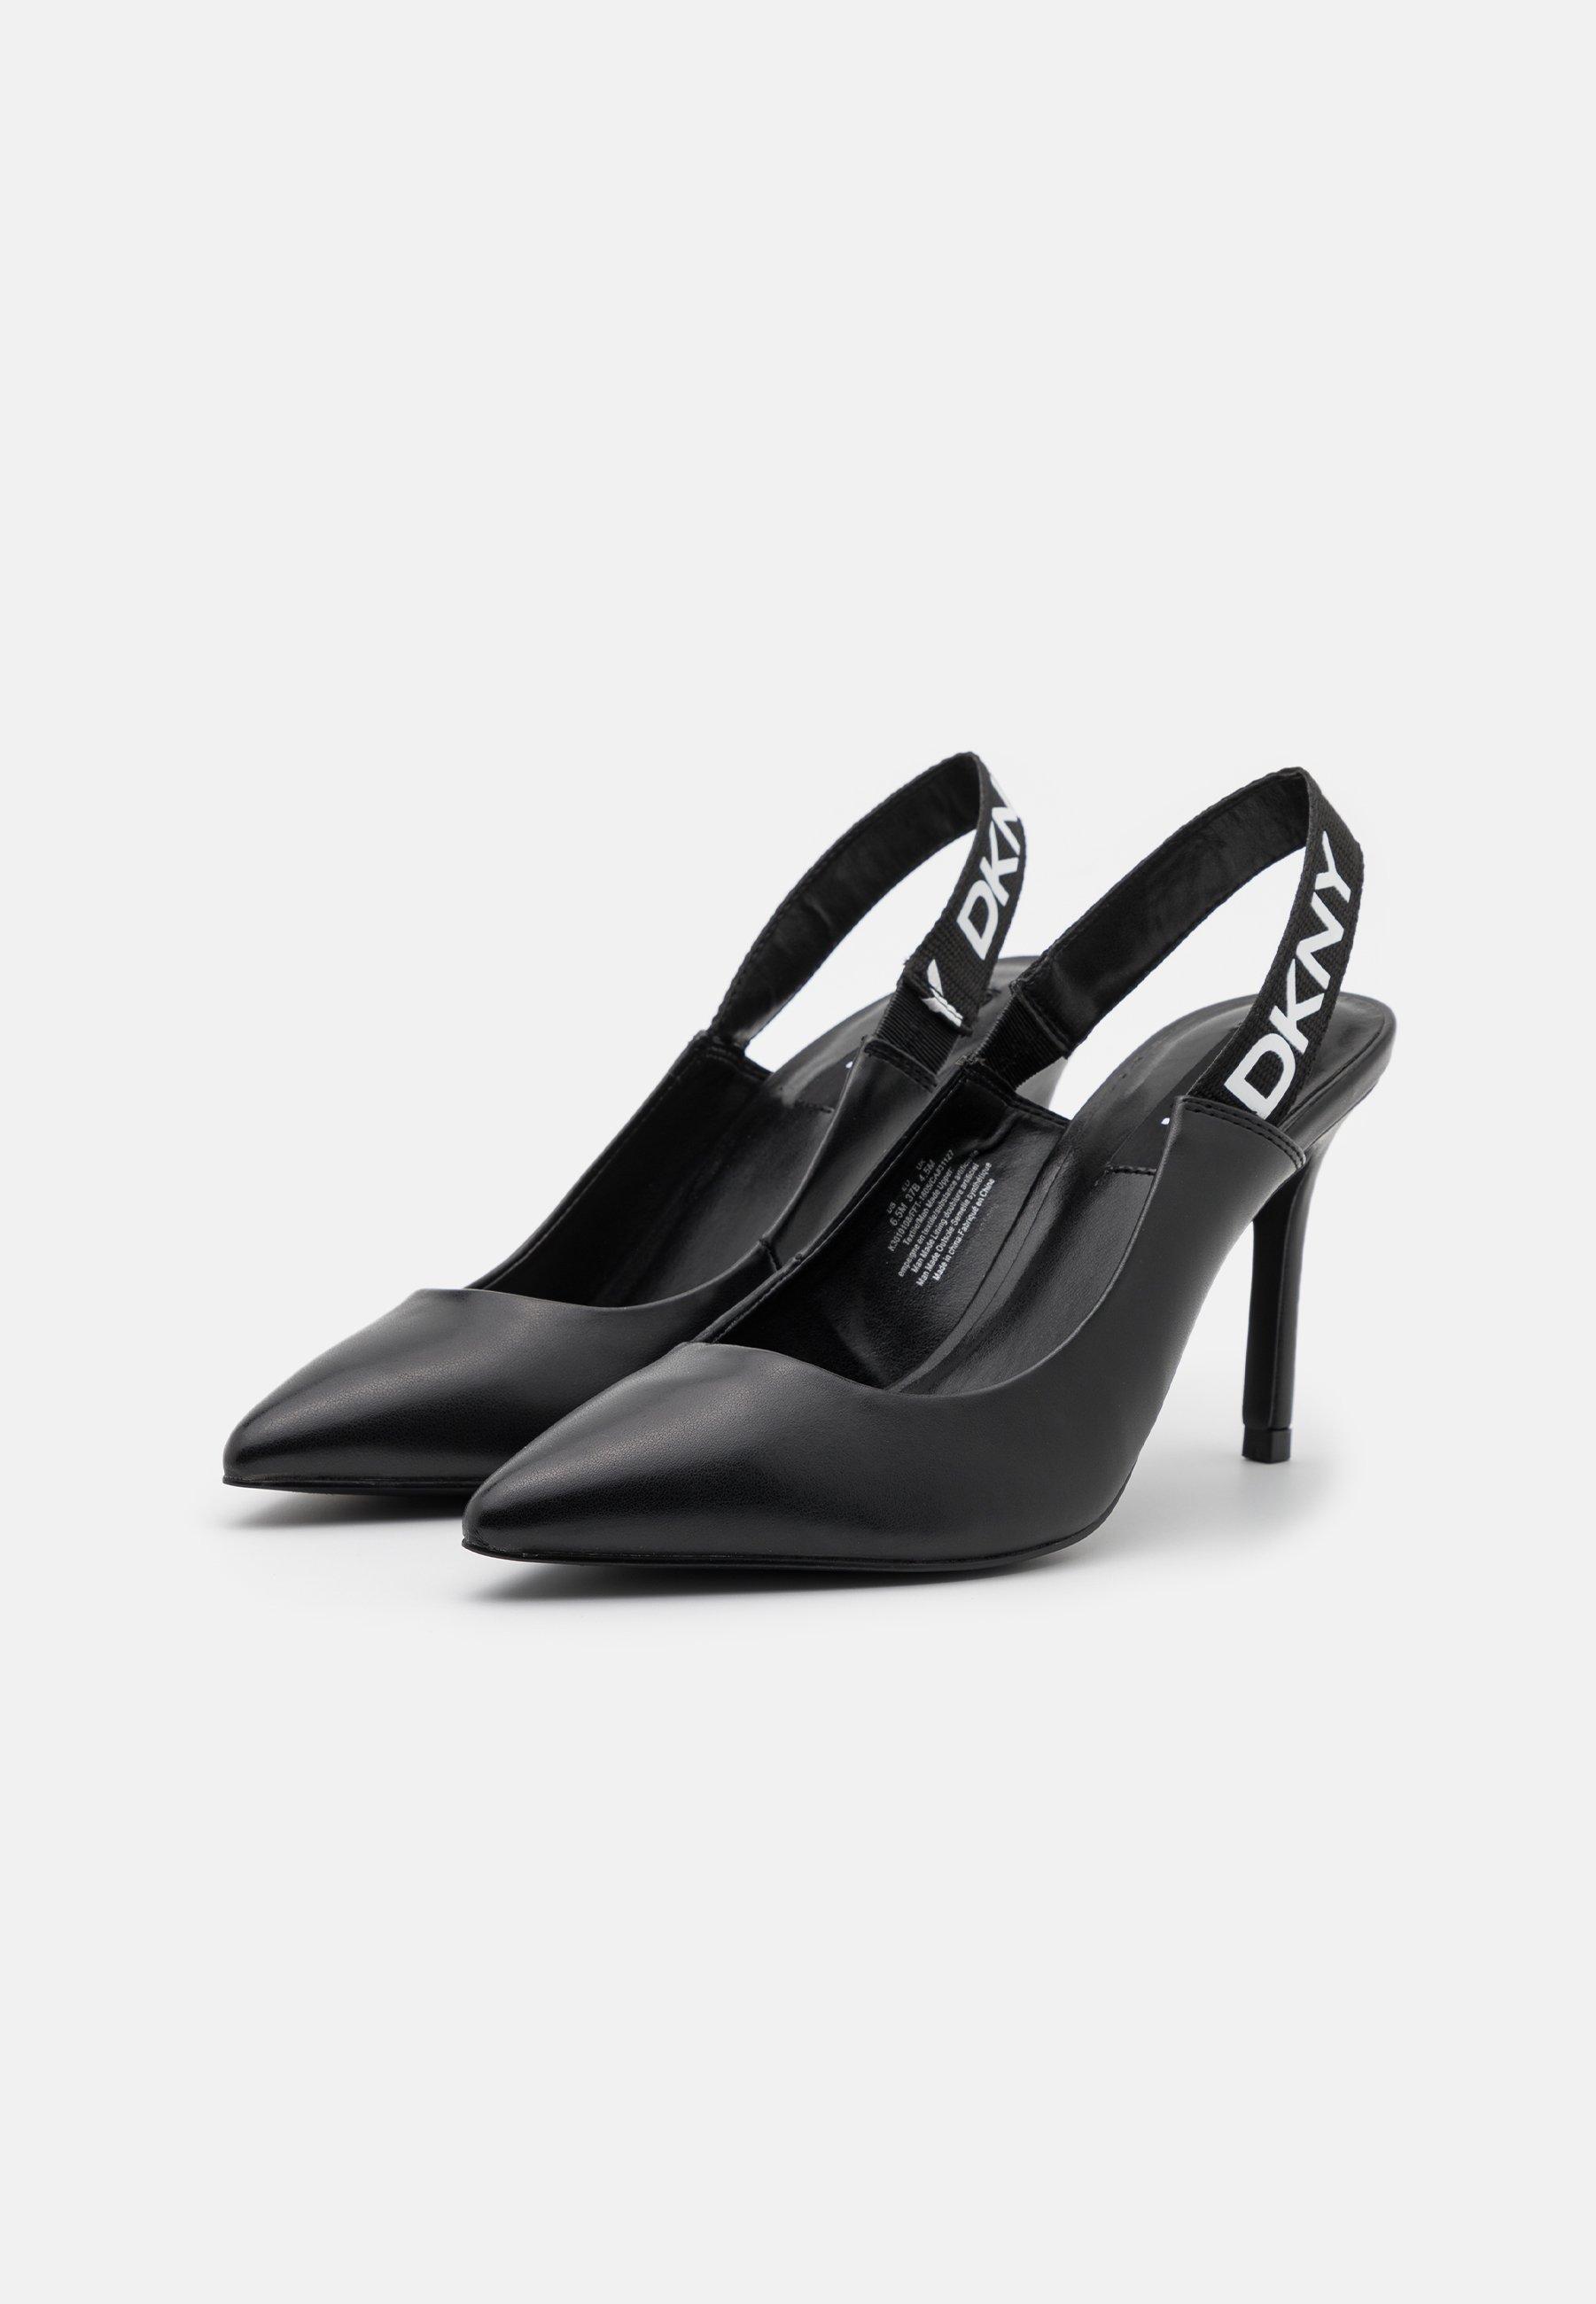 DKNY RAKEL High Heel Pumps black/schwarz